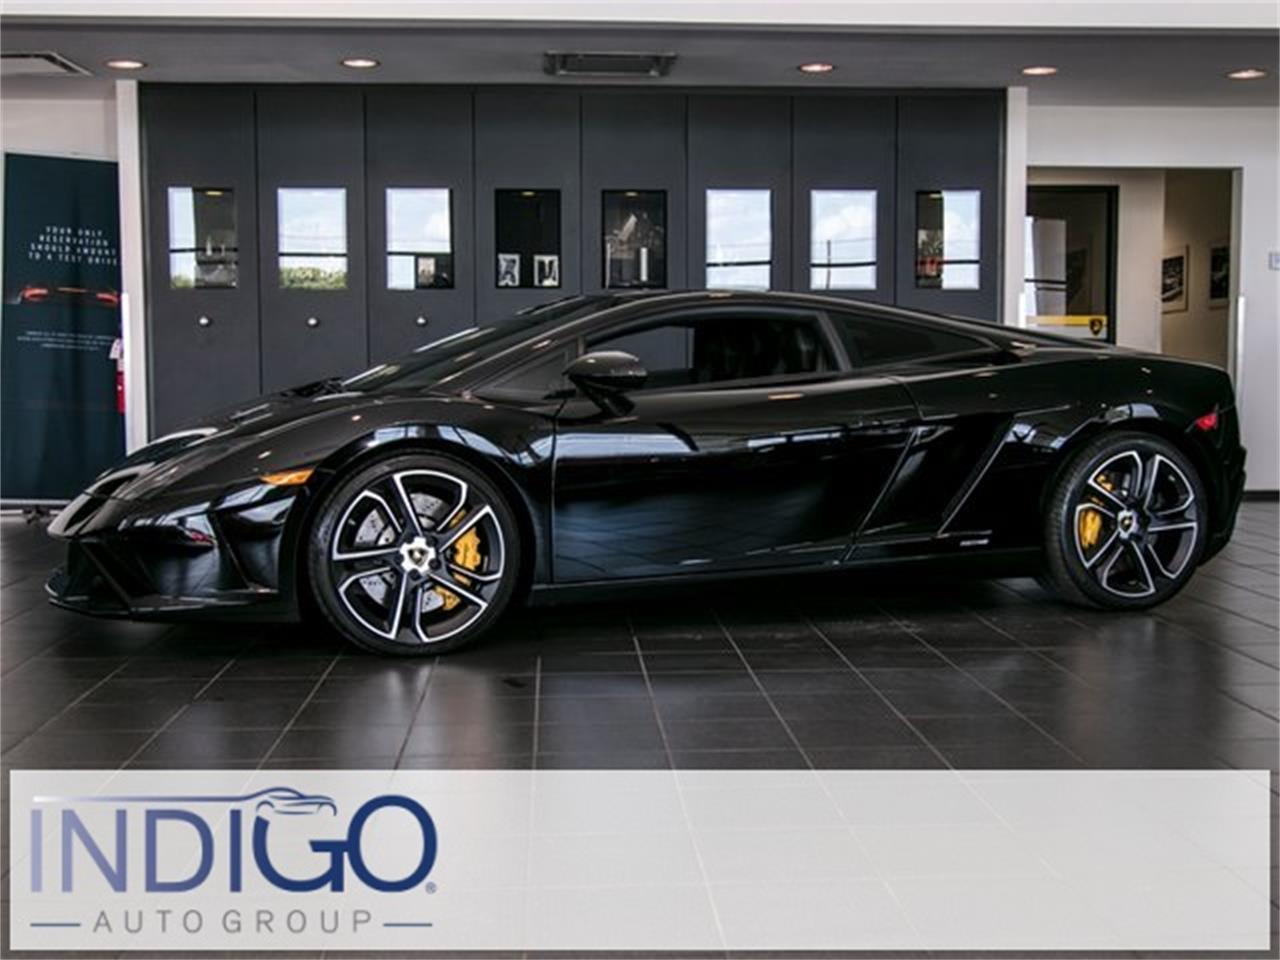 2013 Lamborghini Lp560 4 For Sale Classiccars Com Cc 1013244